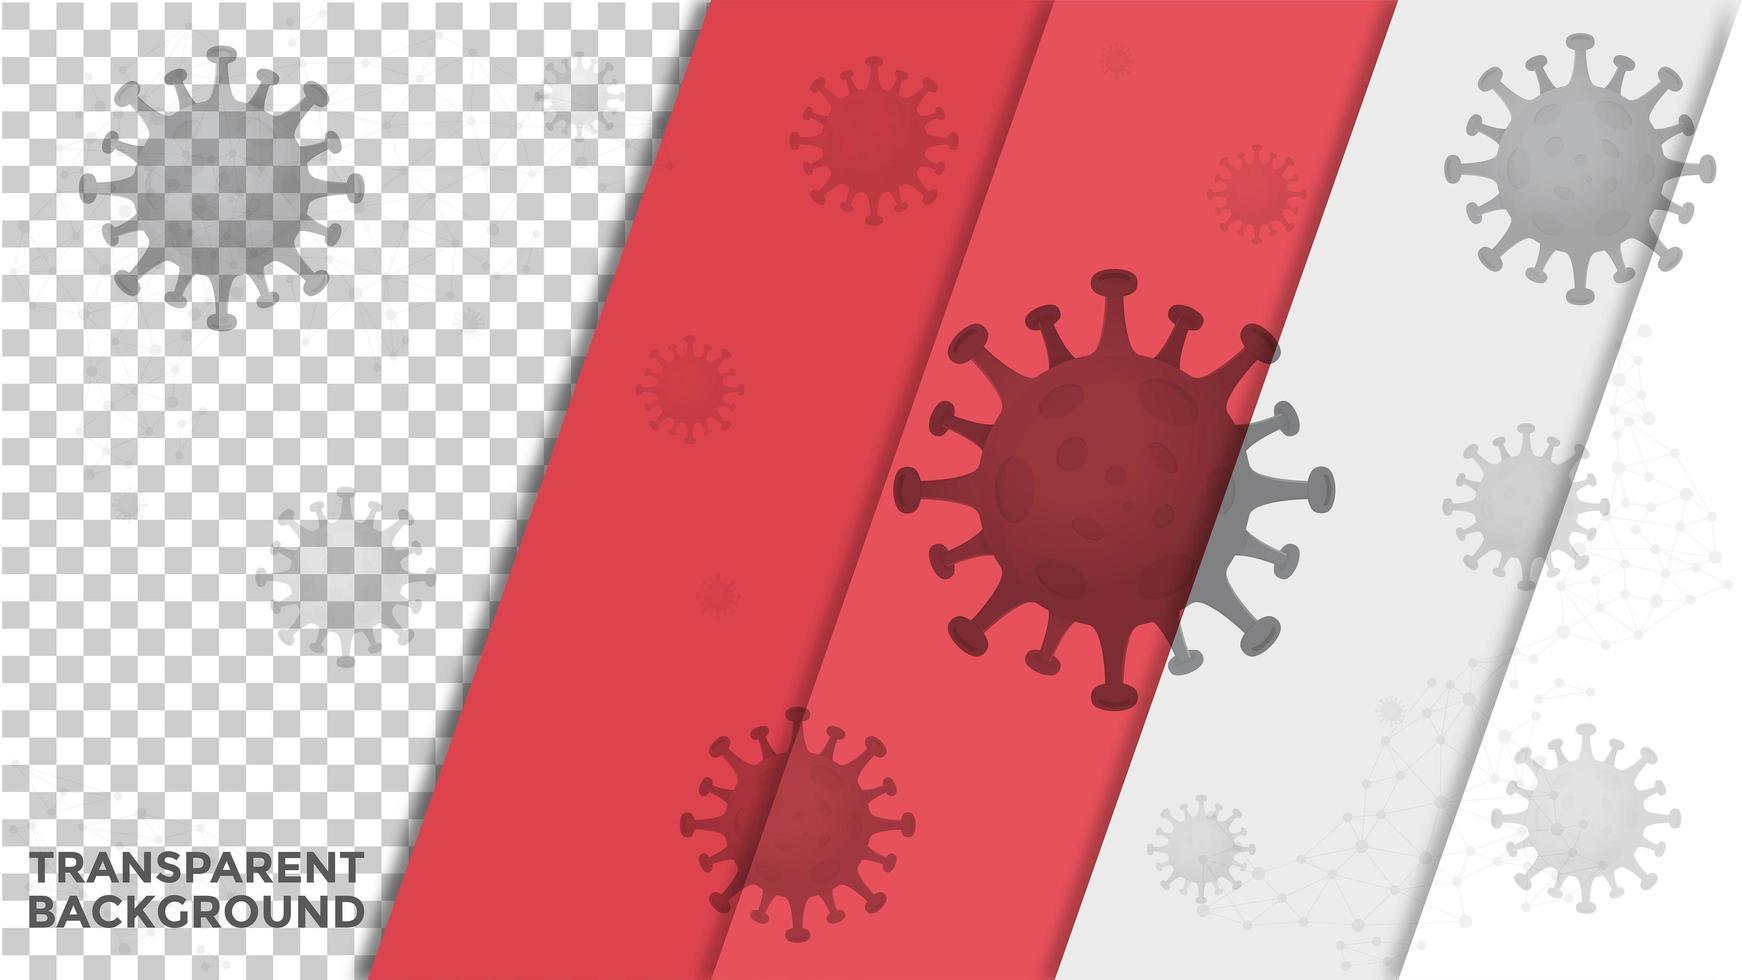 Covid-19 Transparent Virus Background  vector